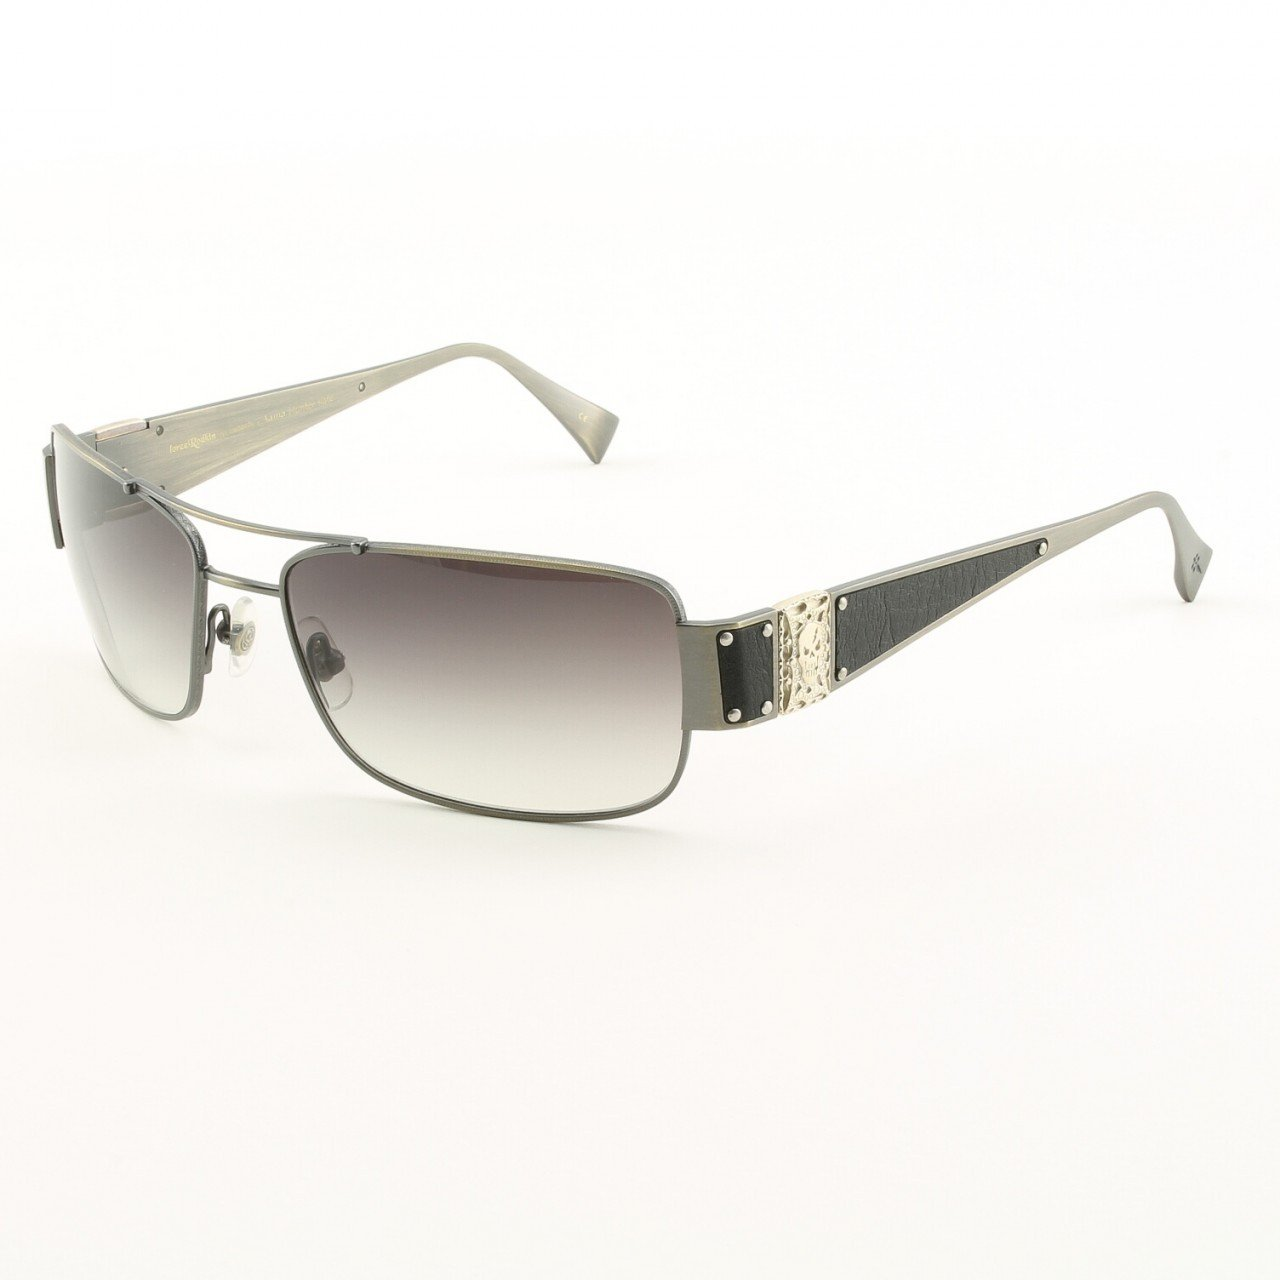 Loree Rodkin Hunter Sunglasses  Slate w/ Gray Gradient Lenses, Leather, Sterling Silver